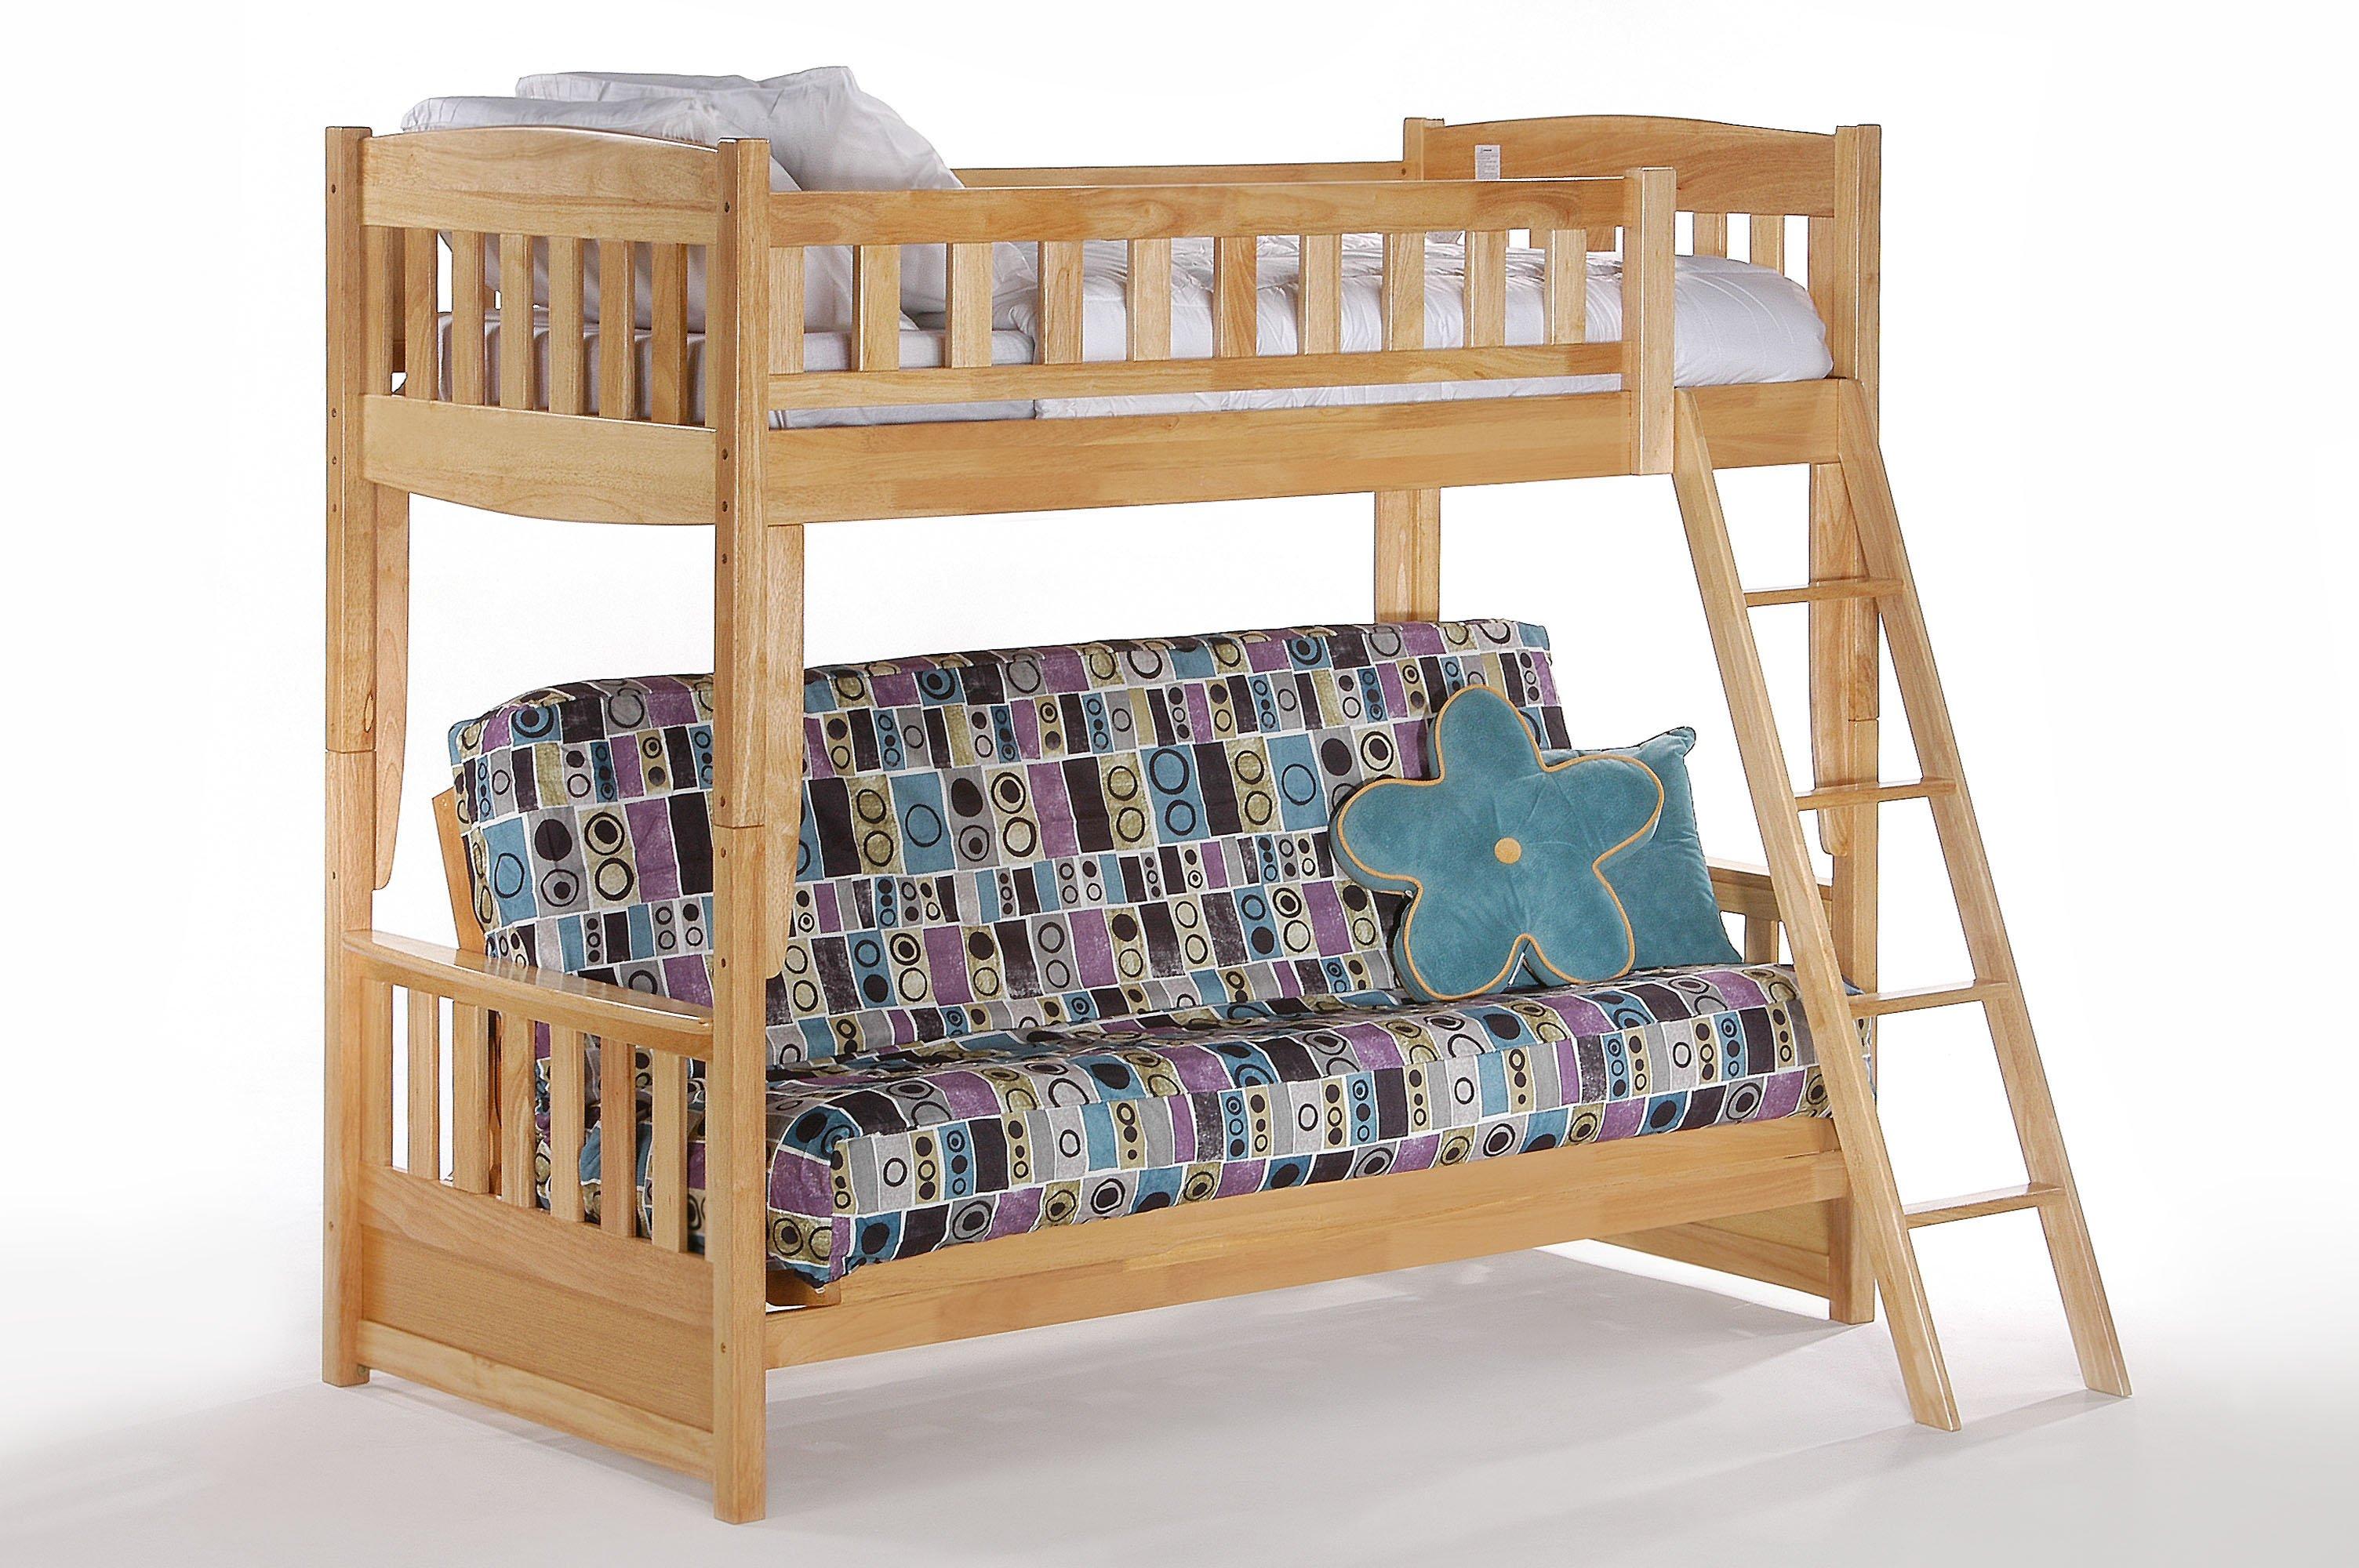 Cinnamon Futon Bunk Bed By Night Day Furniture